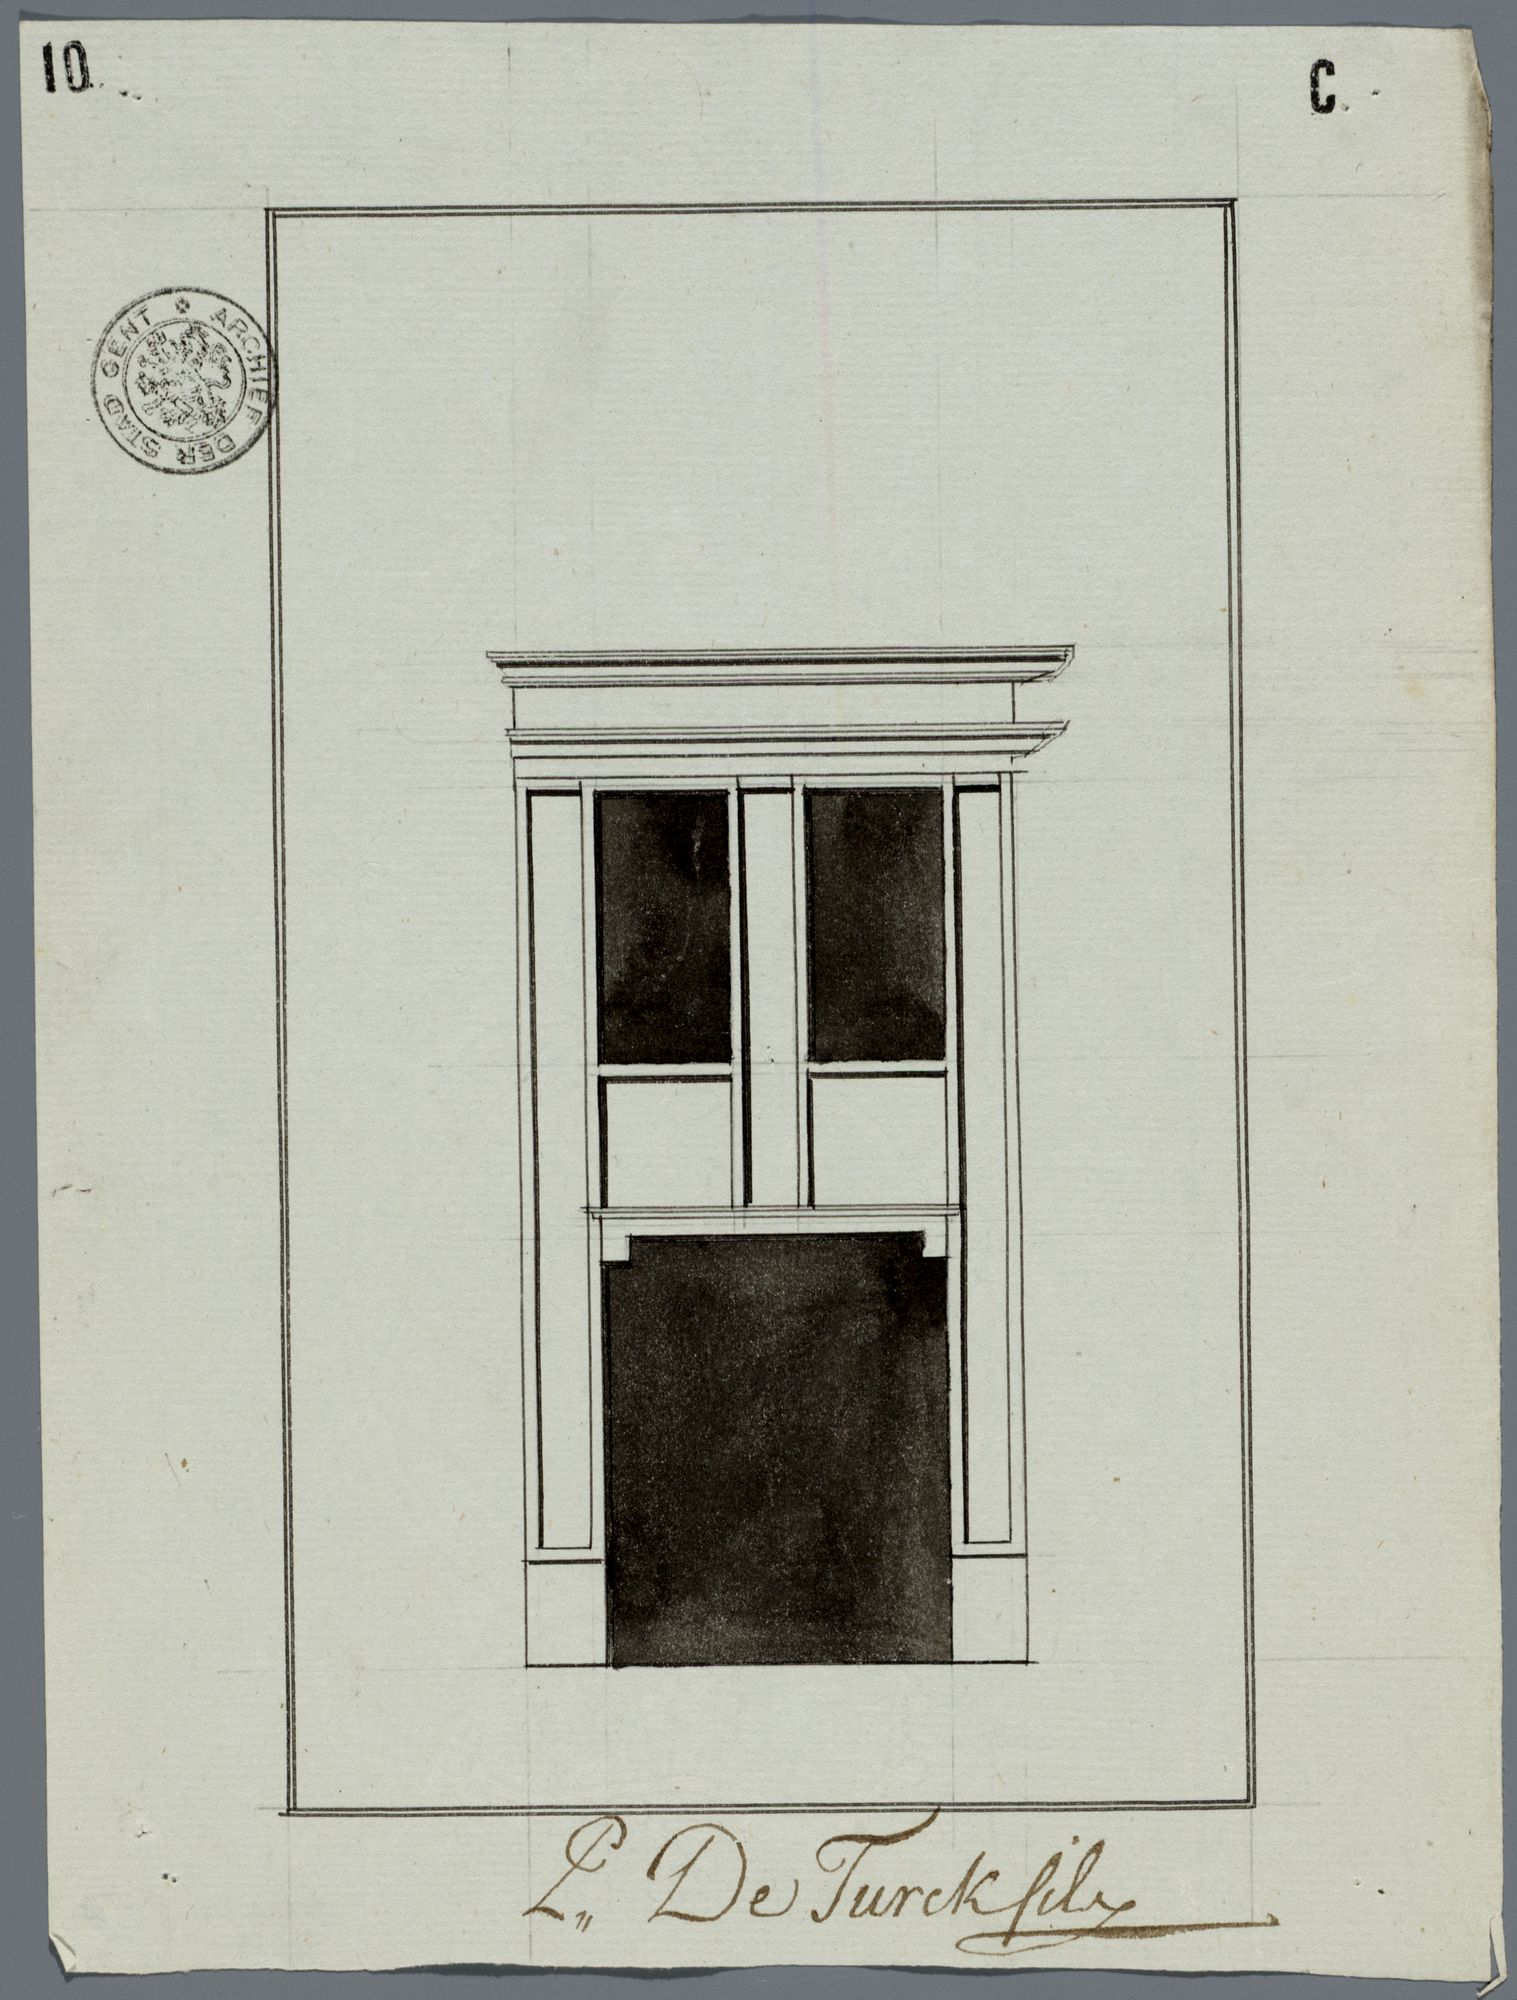 Gent: Huidevetterskaai, 1792: opstand voorgevel: oude toestand